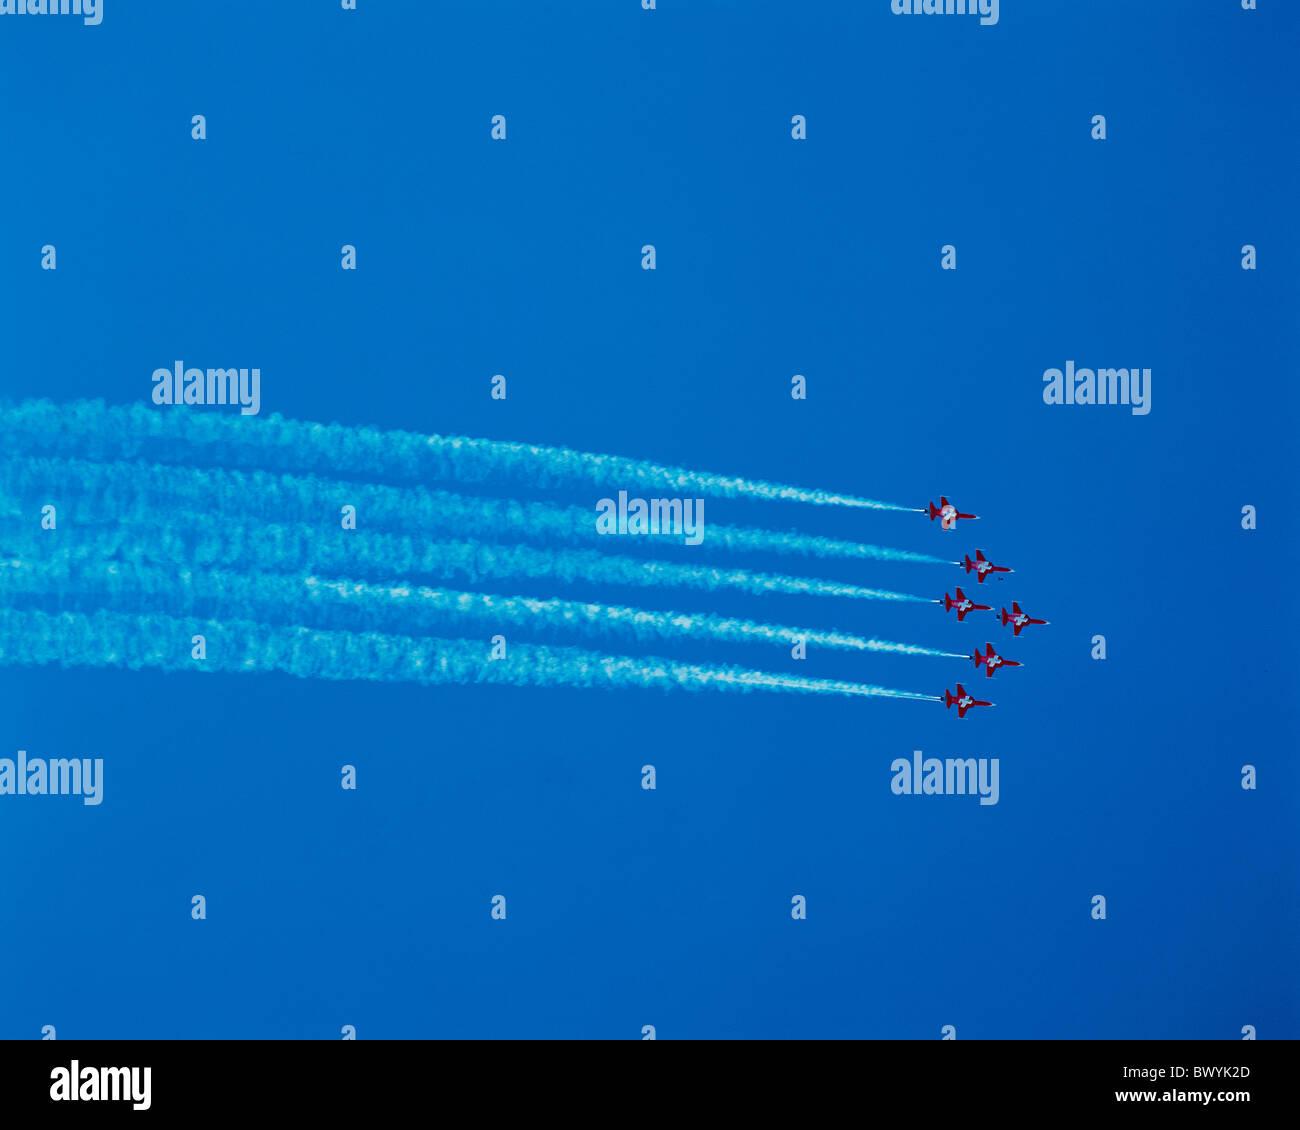 jet jet airplane formation flight patrol Suisse airman plane relay blue sky Switzerland Europe Bern airpla - Stock Image